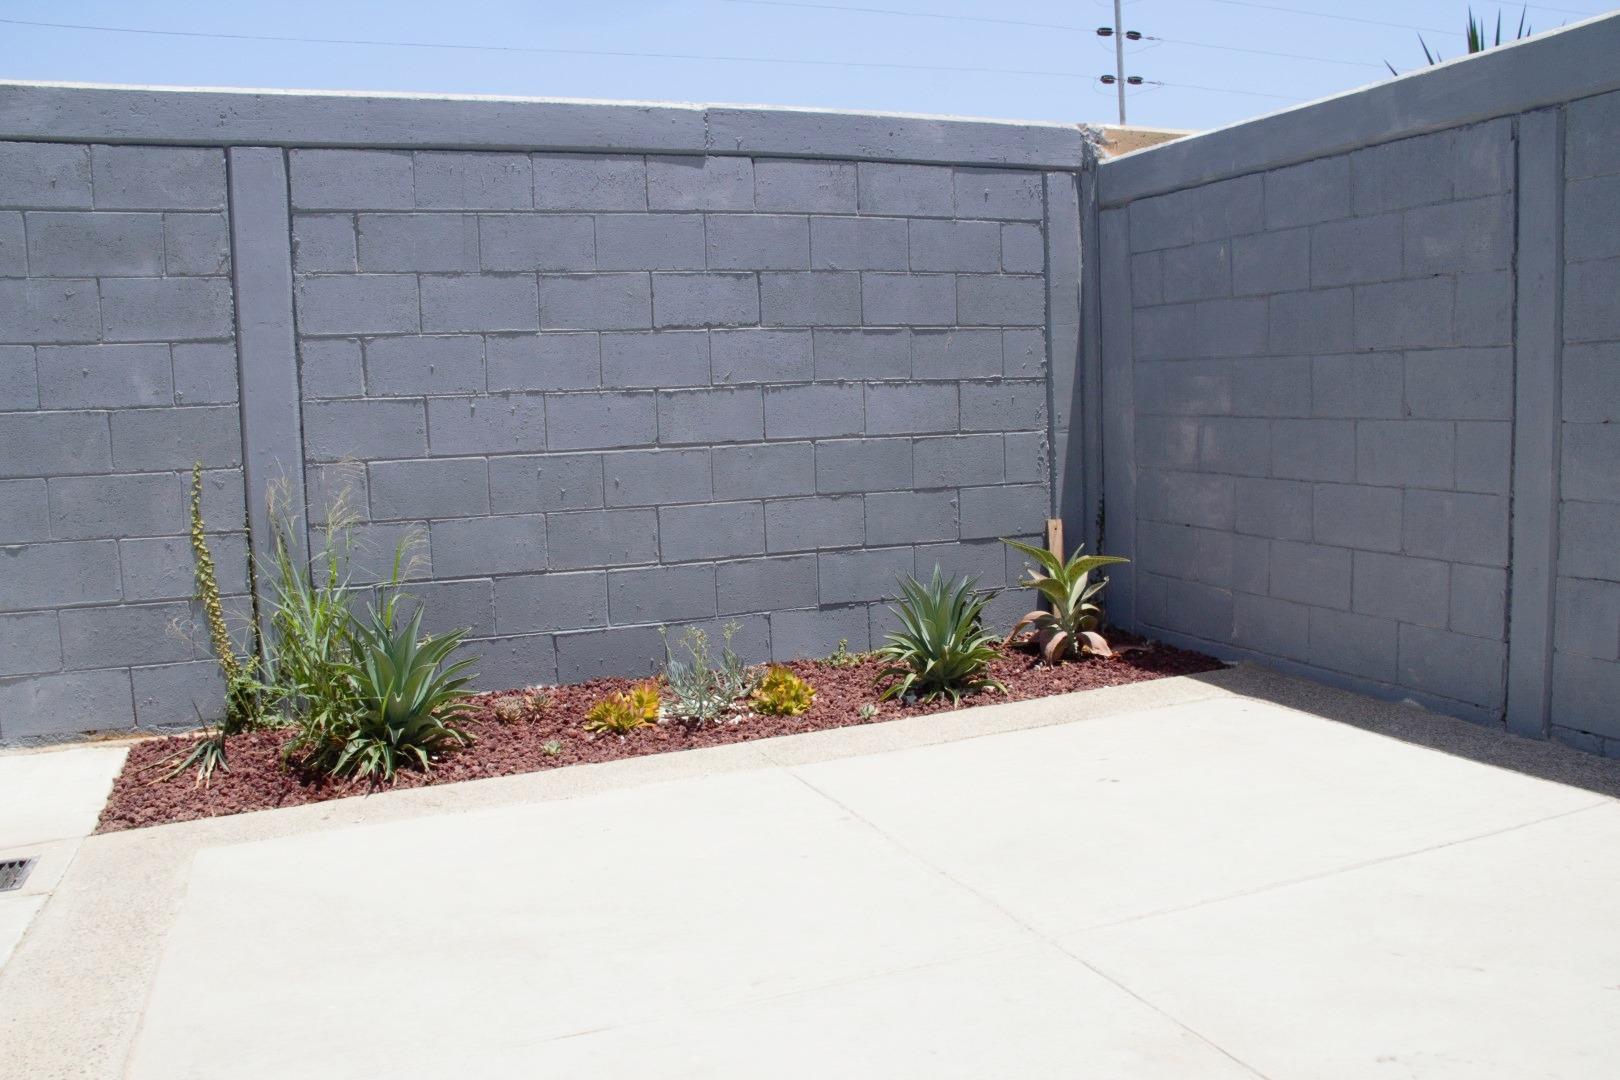 Private patio (furniture not shown).